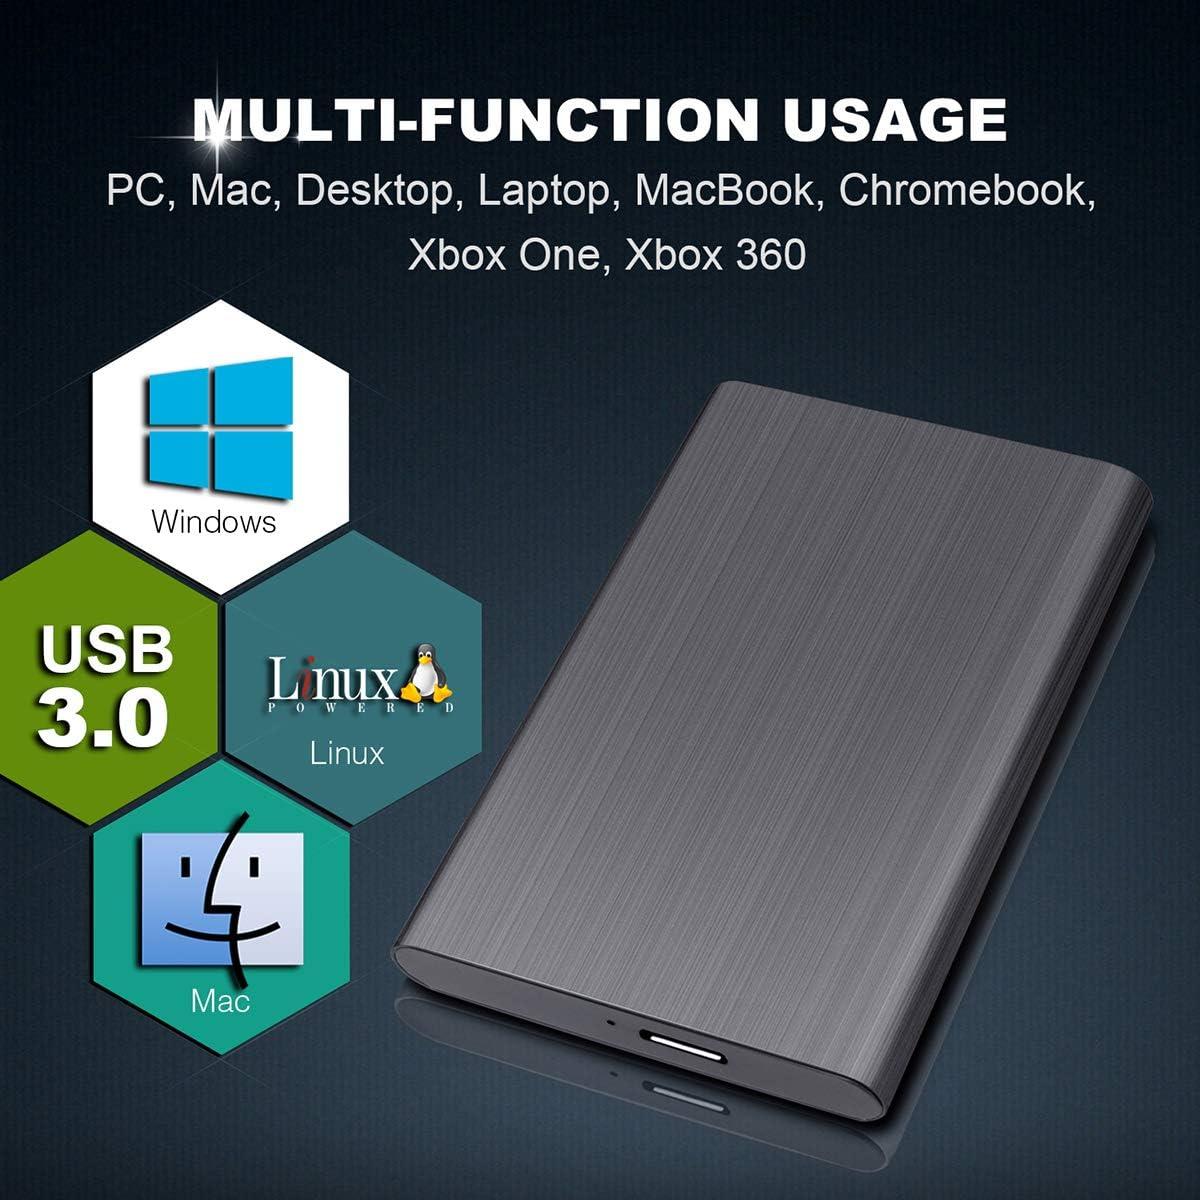 Mac 1tb, Rojo Xbox Disco Duro Externo 1tb Port/átil 2.5 MacBook Chromebook USB3.0 SATA HDD Almacenamiento para PC